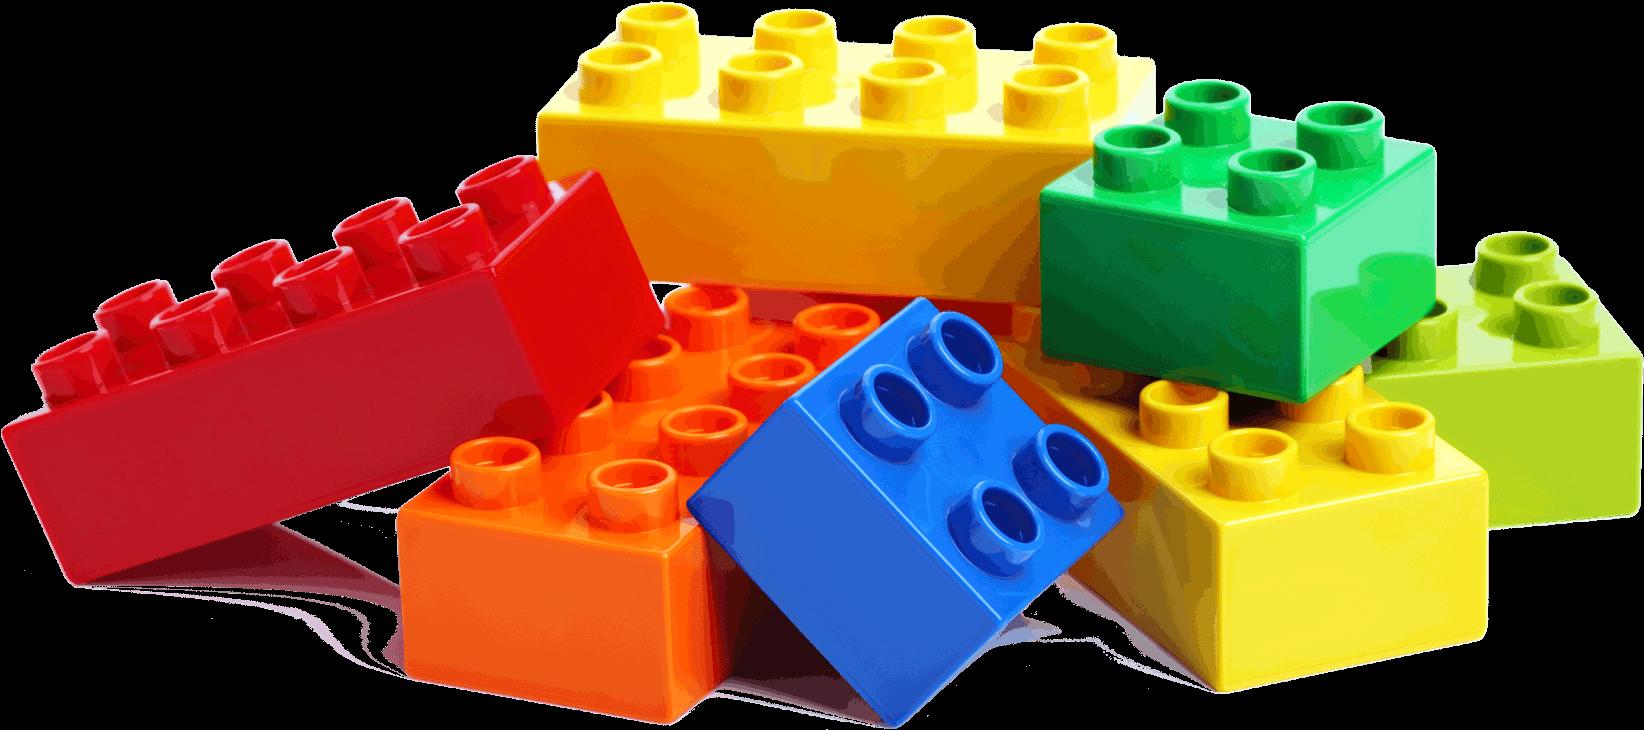 HD Legos Clipart Transparent PNG Image Download.